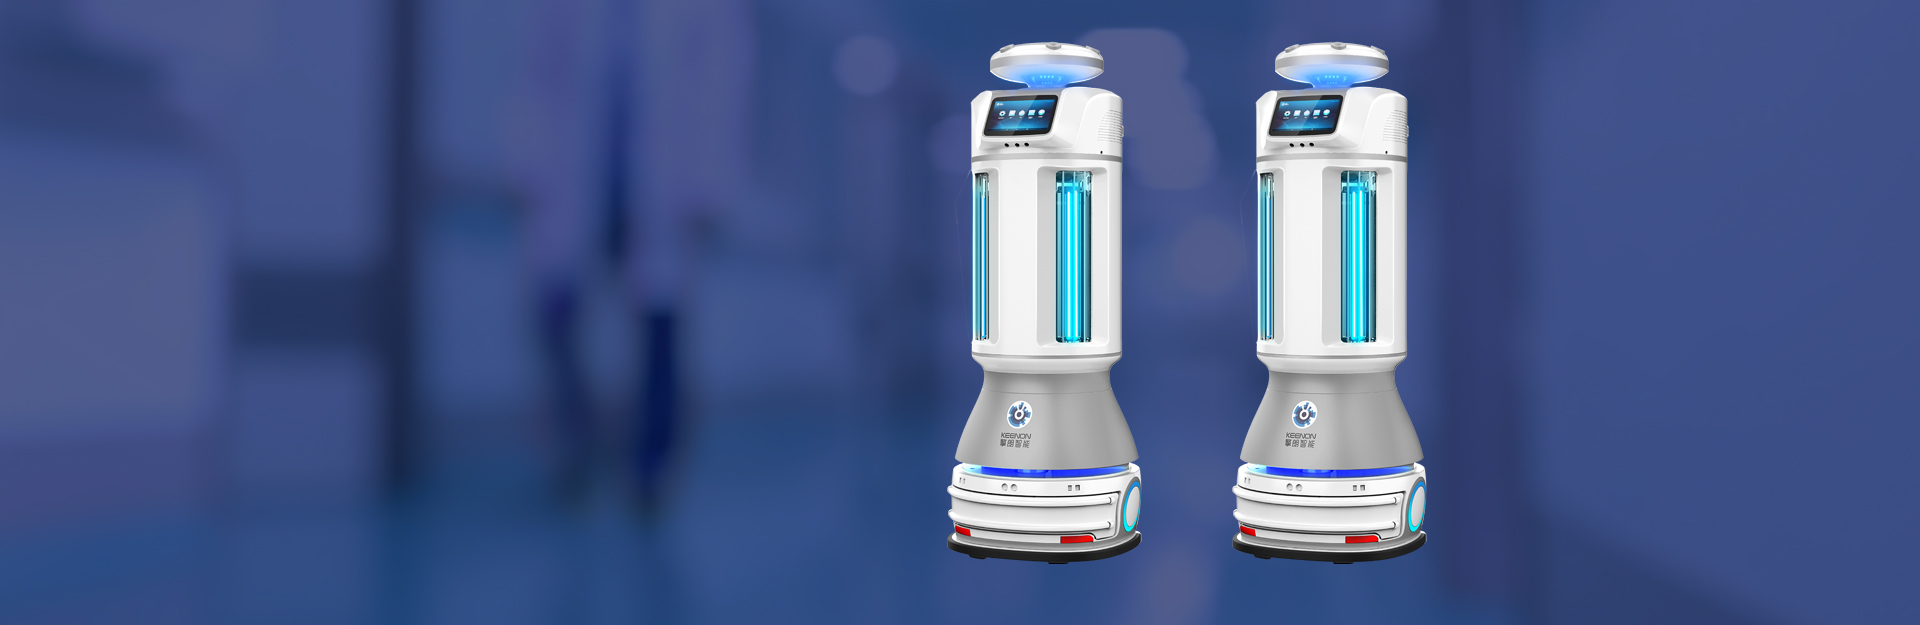 Disinfection Systems - M2 Autonomous Disinfection System